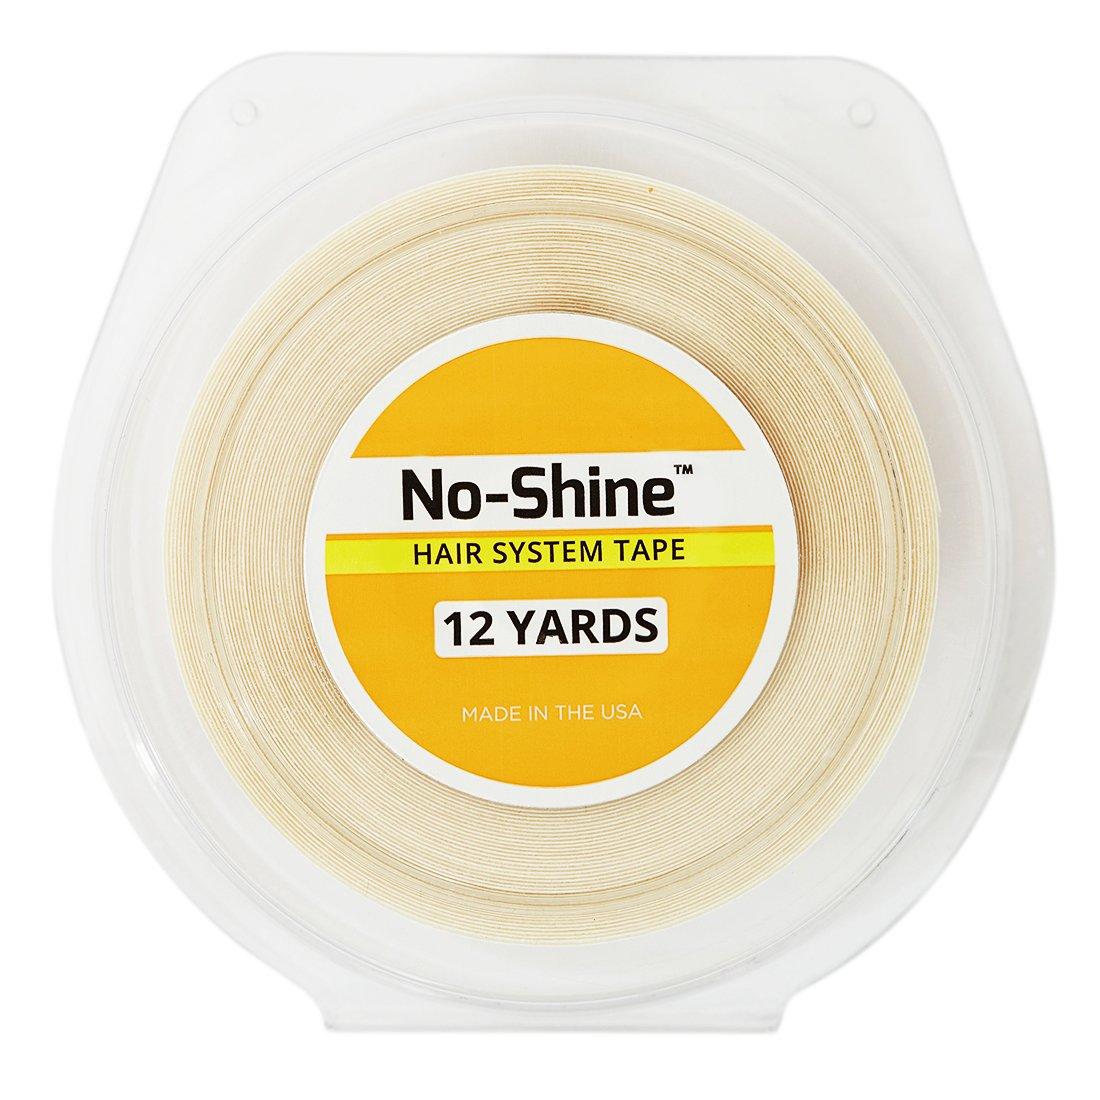 No Shine Bonding Double-Sided Tape Walker 1/2 X 12 Yards by Walker Tape by Walker Tape